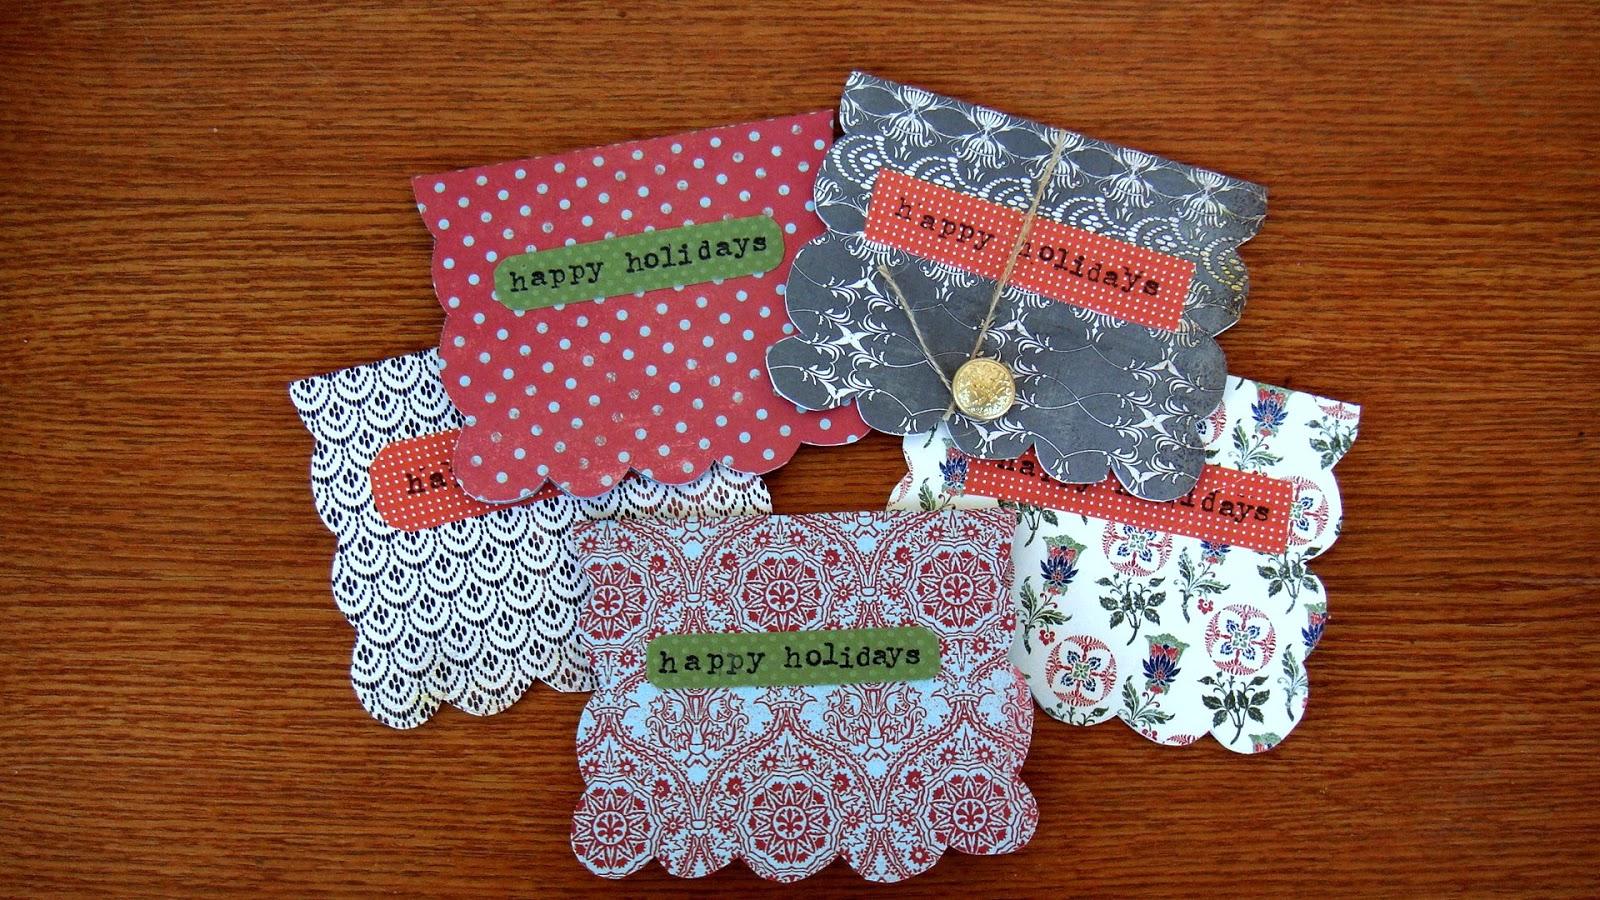 Arts crafts how to make greeting card at home photo credit amy gizienski kristyandbryce Choice Image